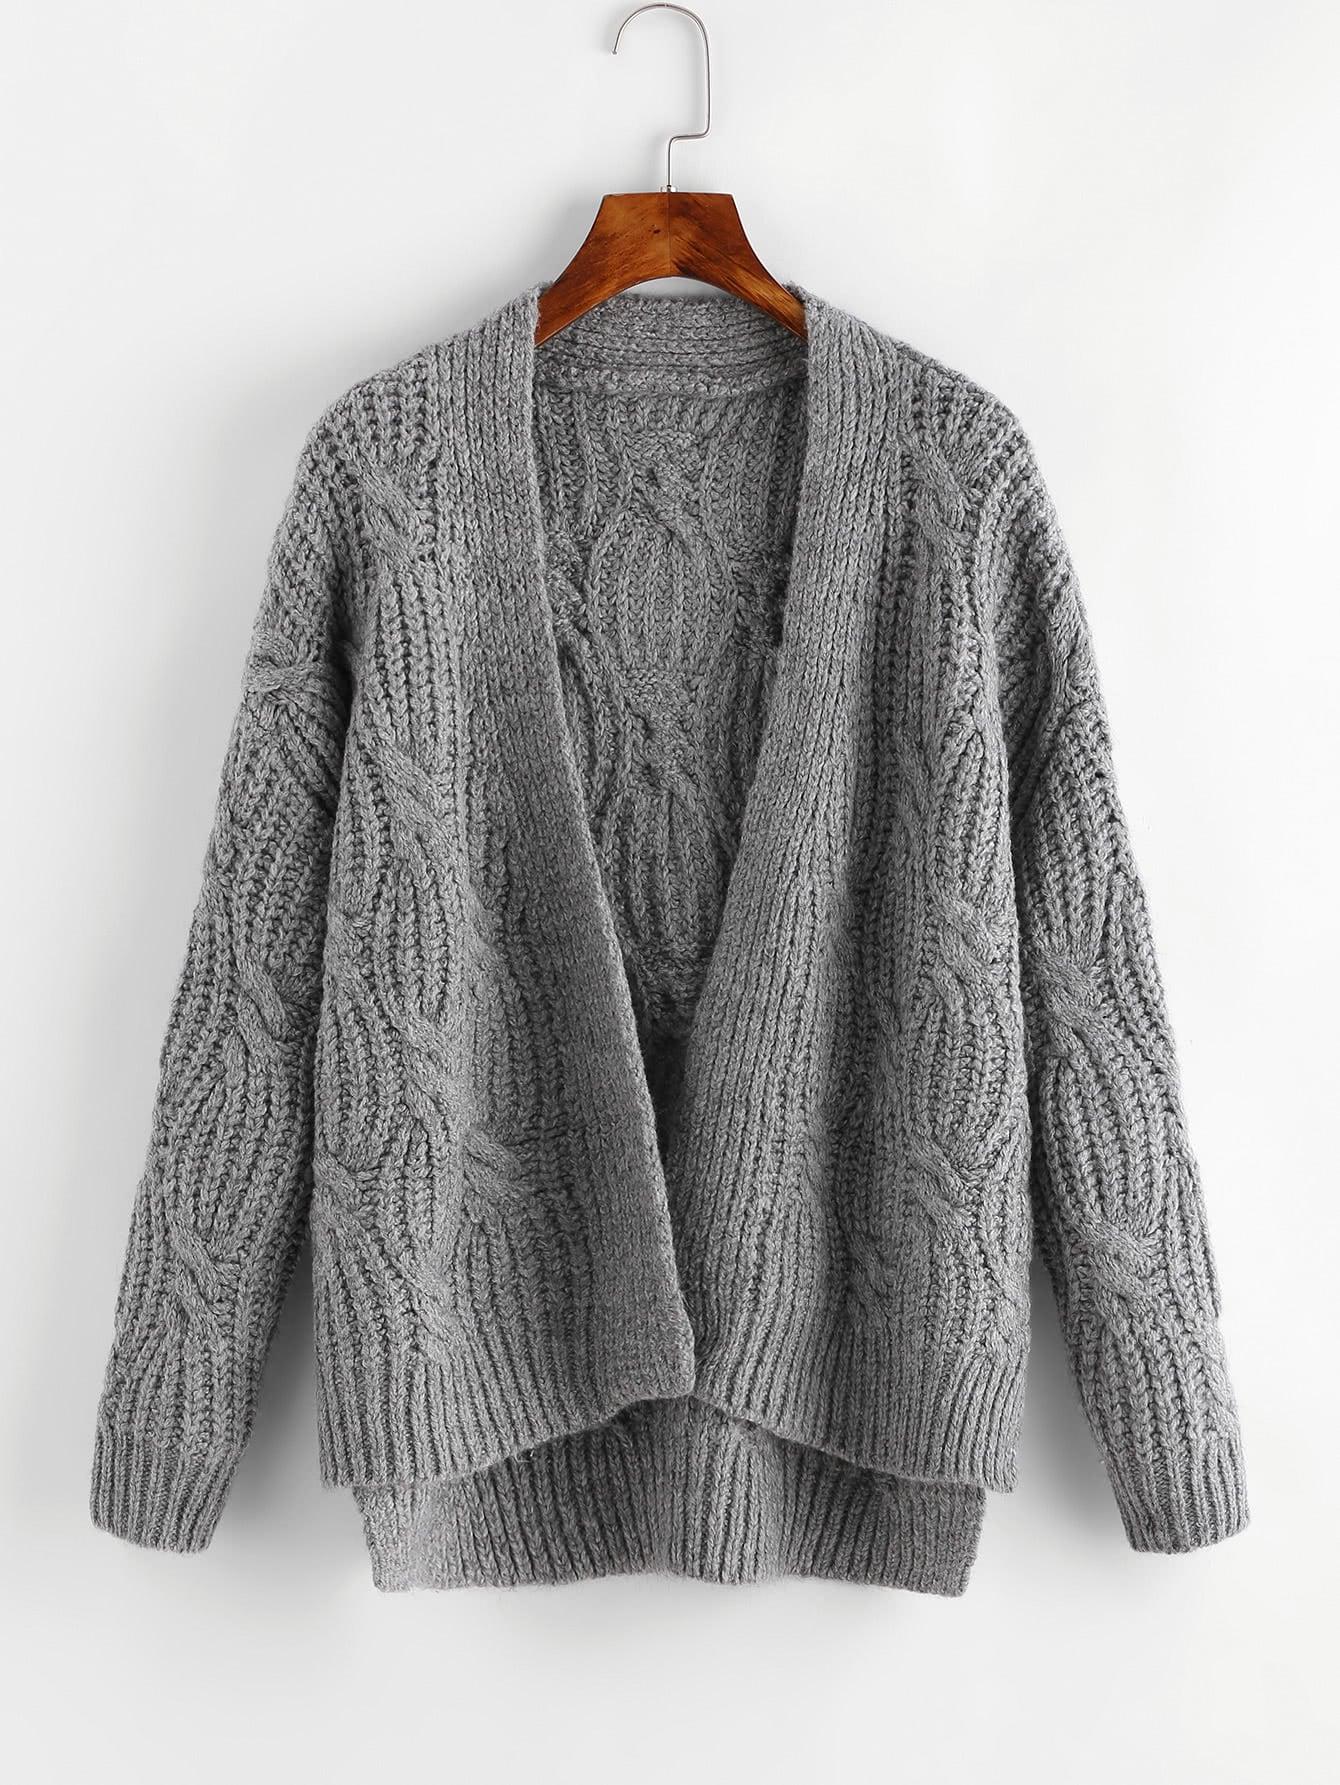 Cable Chunky Knit Cardigan -SheIn(Sheinside)